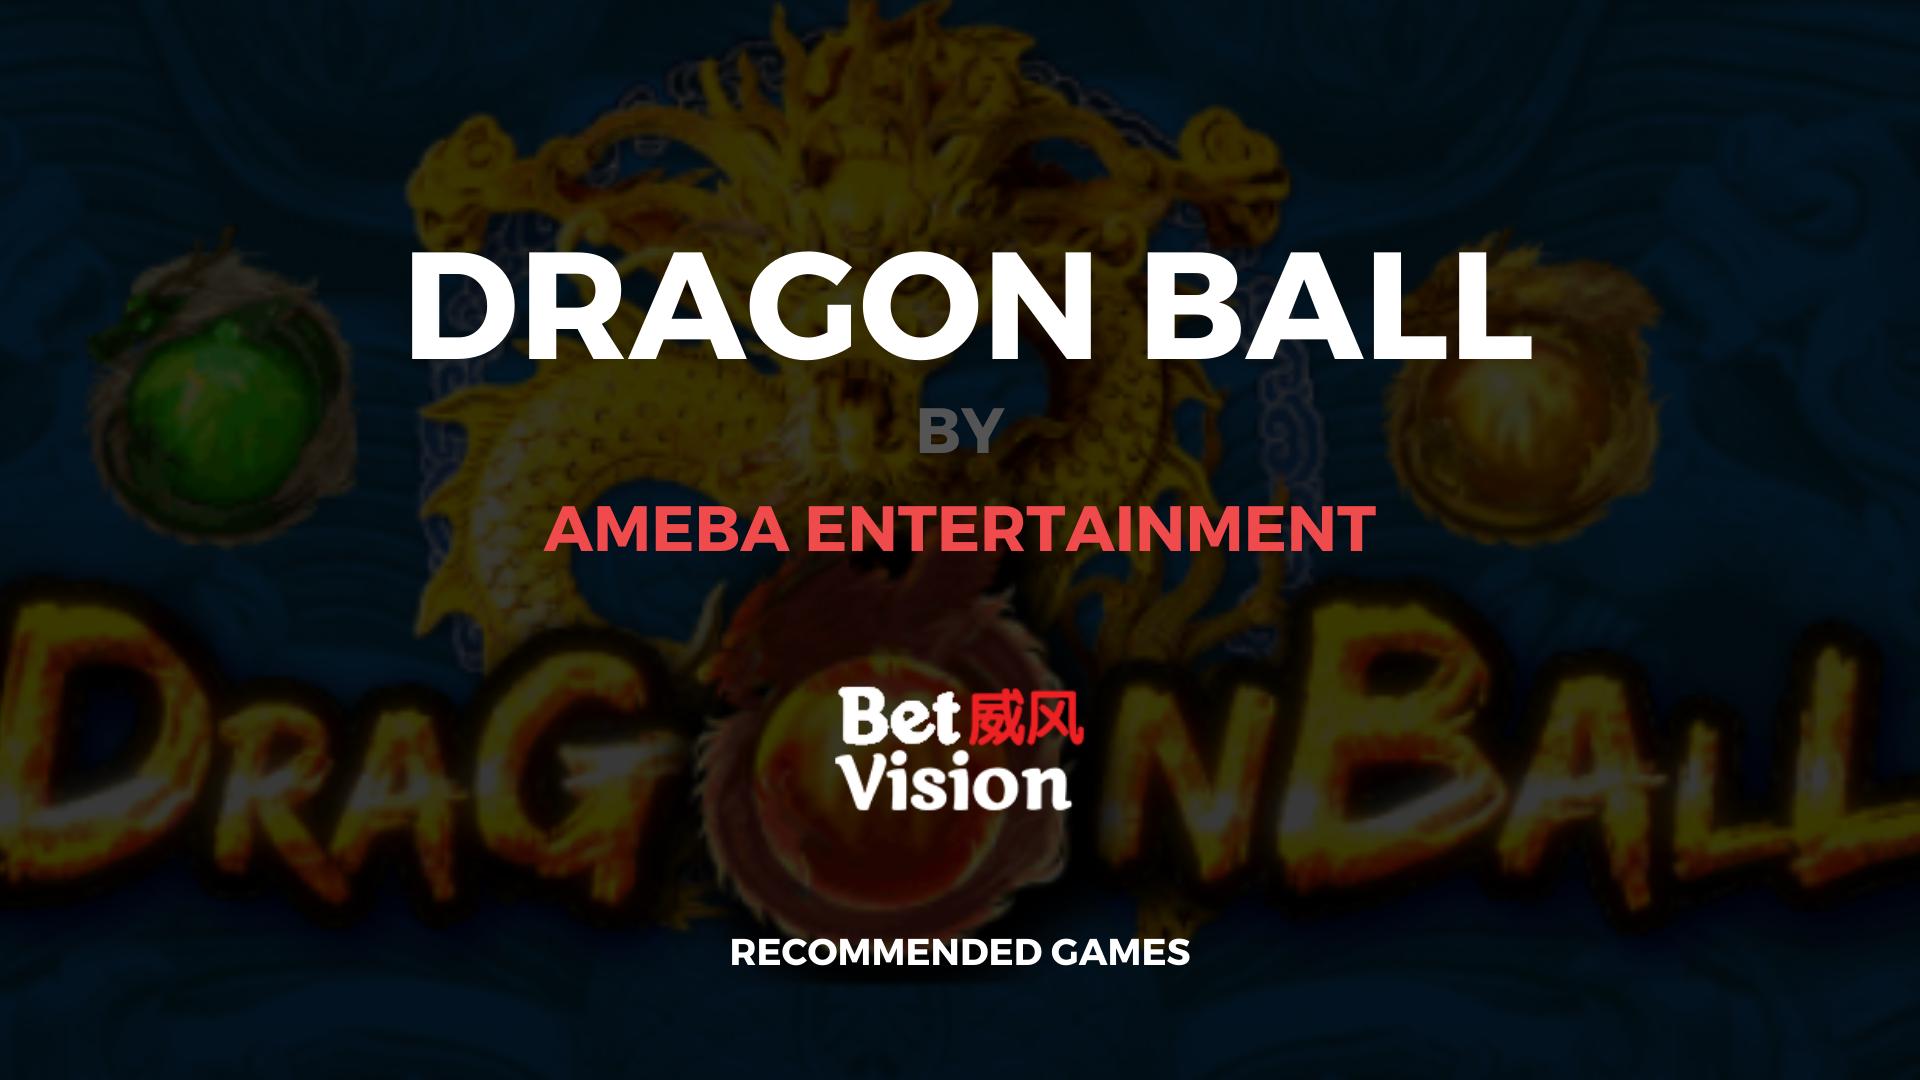 Thumb - Dragon Ball by Ameba Entertainment